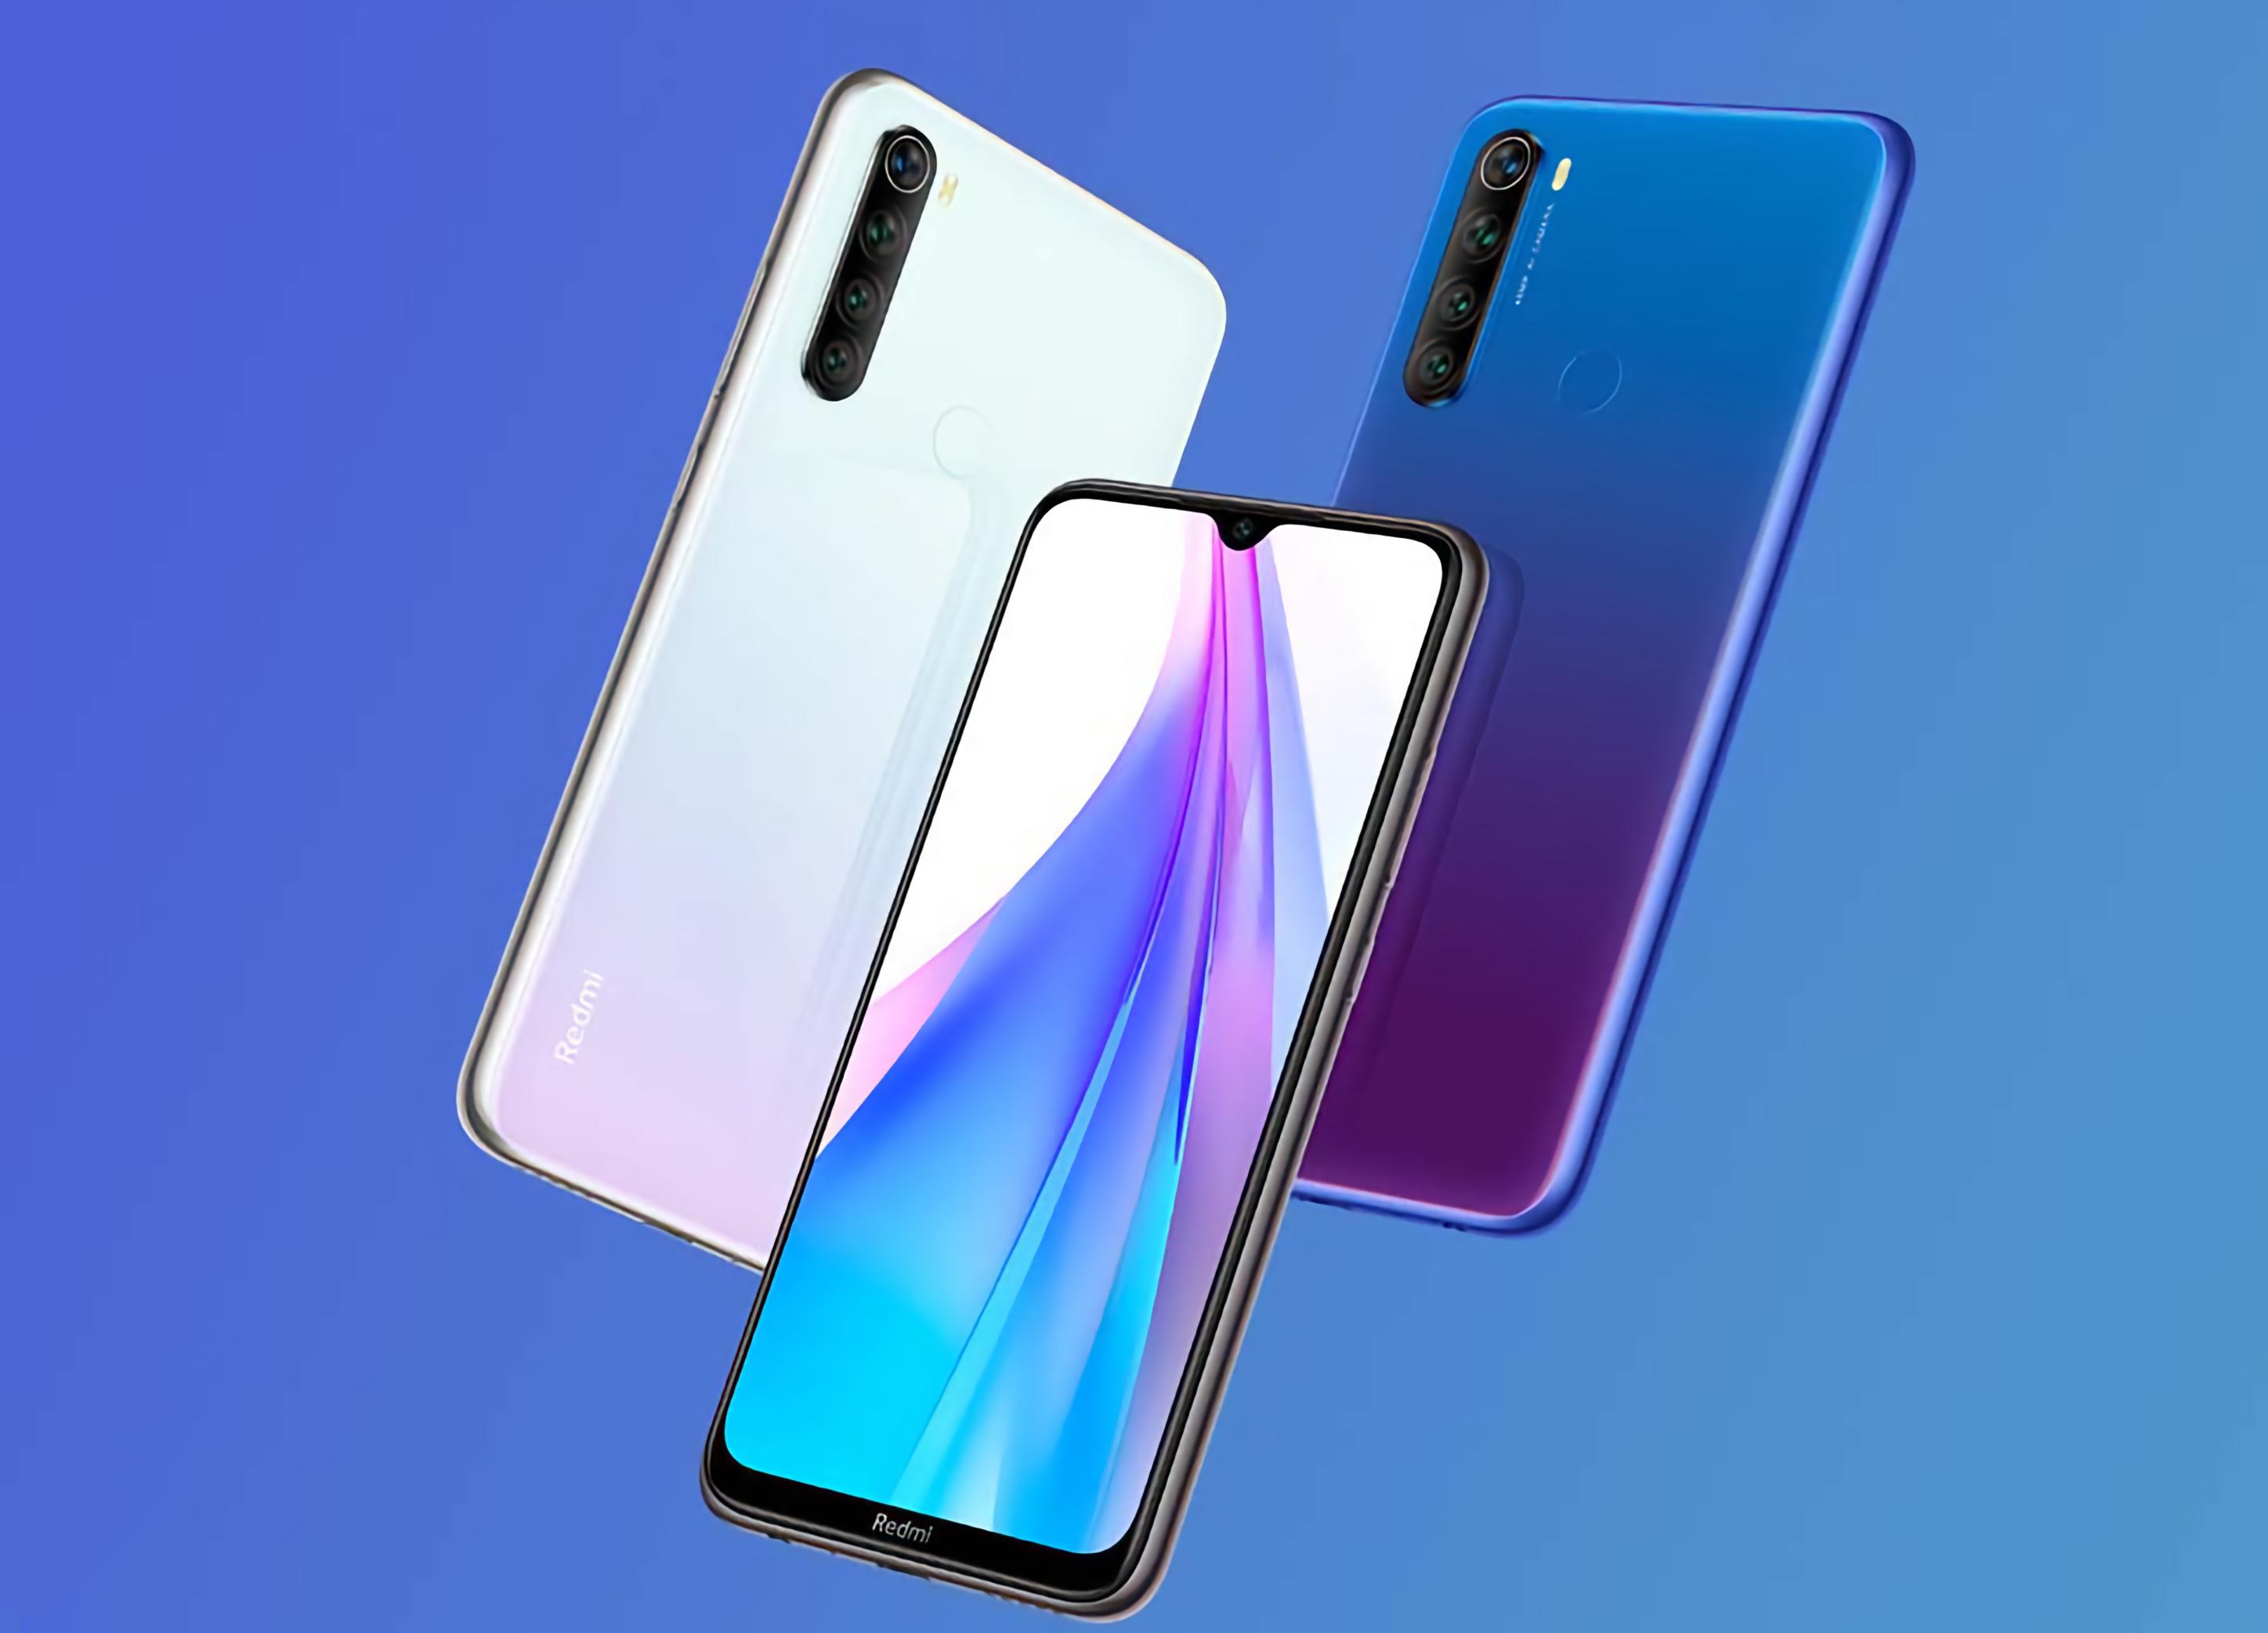 Redmi Note 8 и Redmi Note 8T стали самыми продаваемыми смартфонами в первом квартале 2020 года после iPhone 11